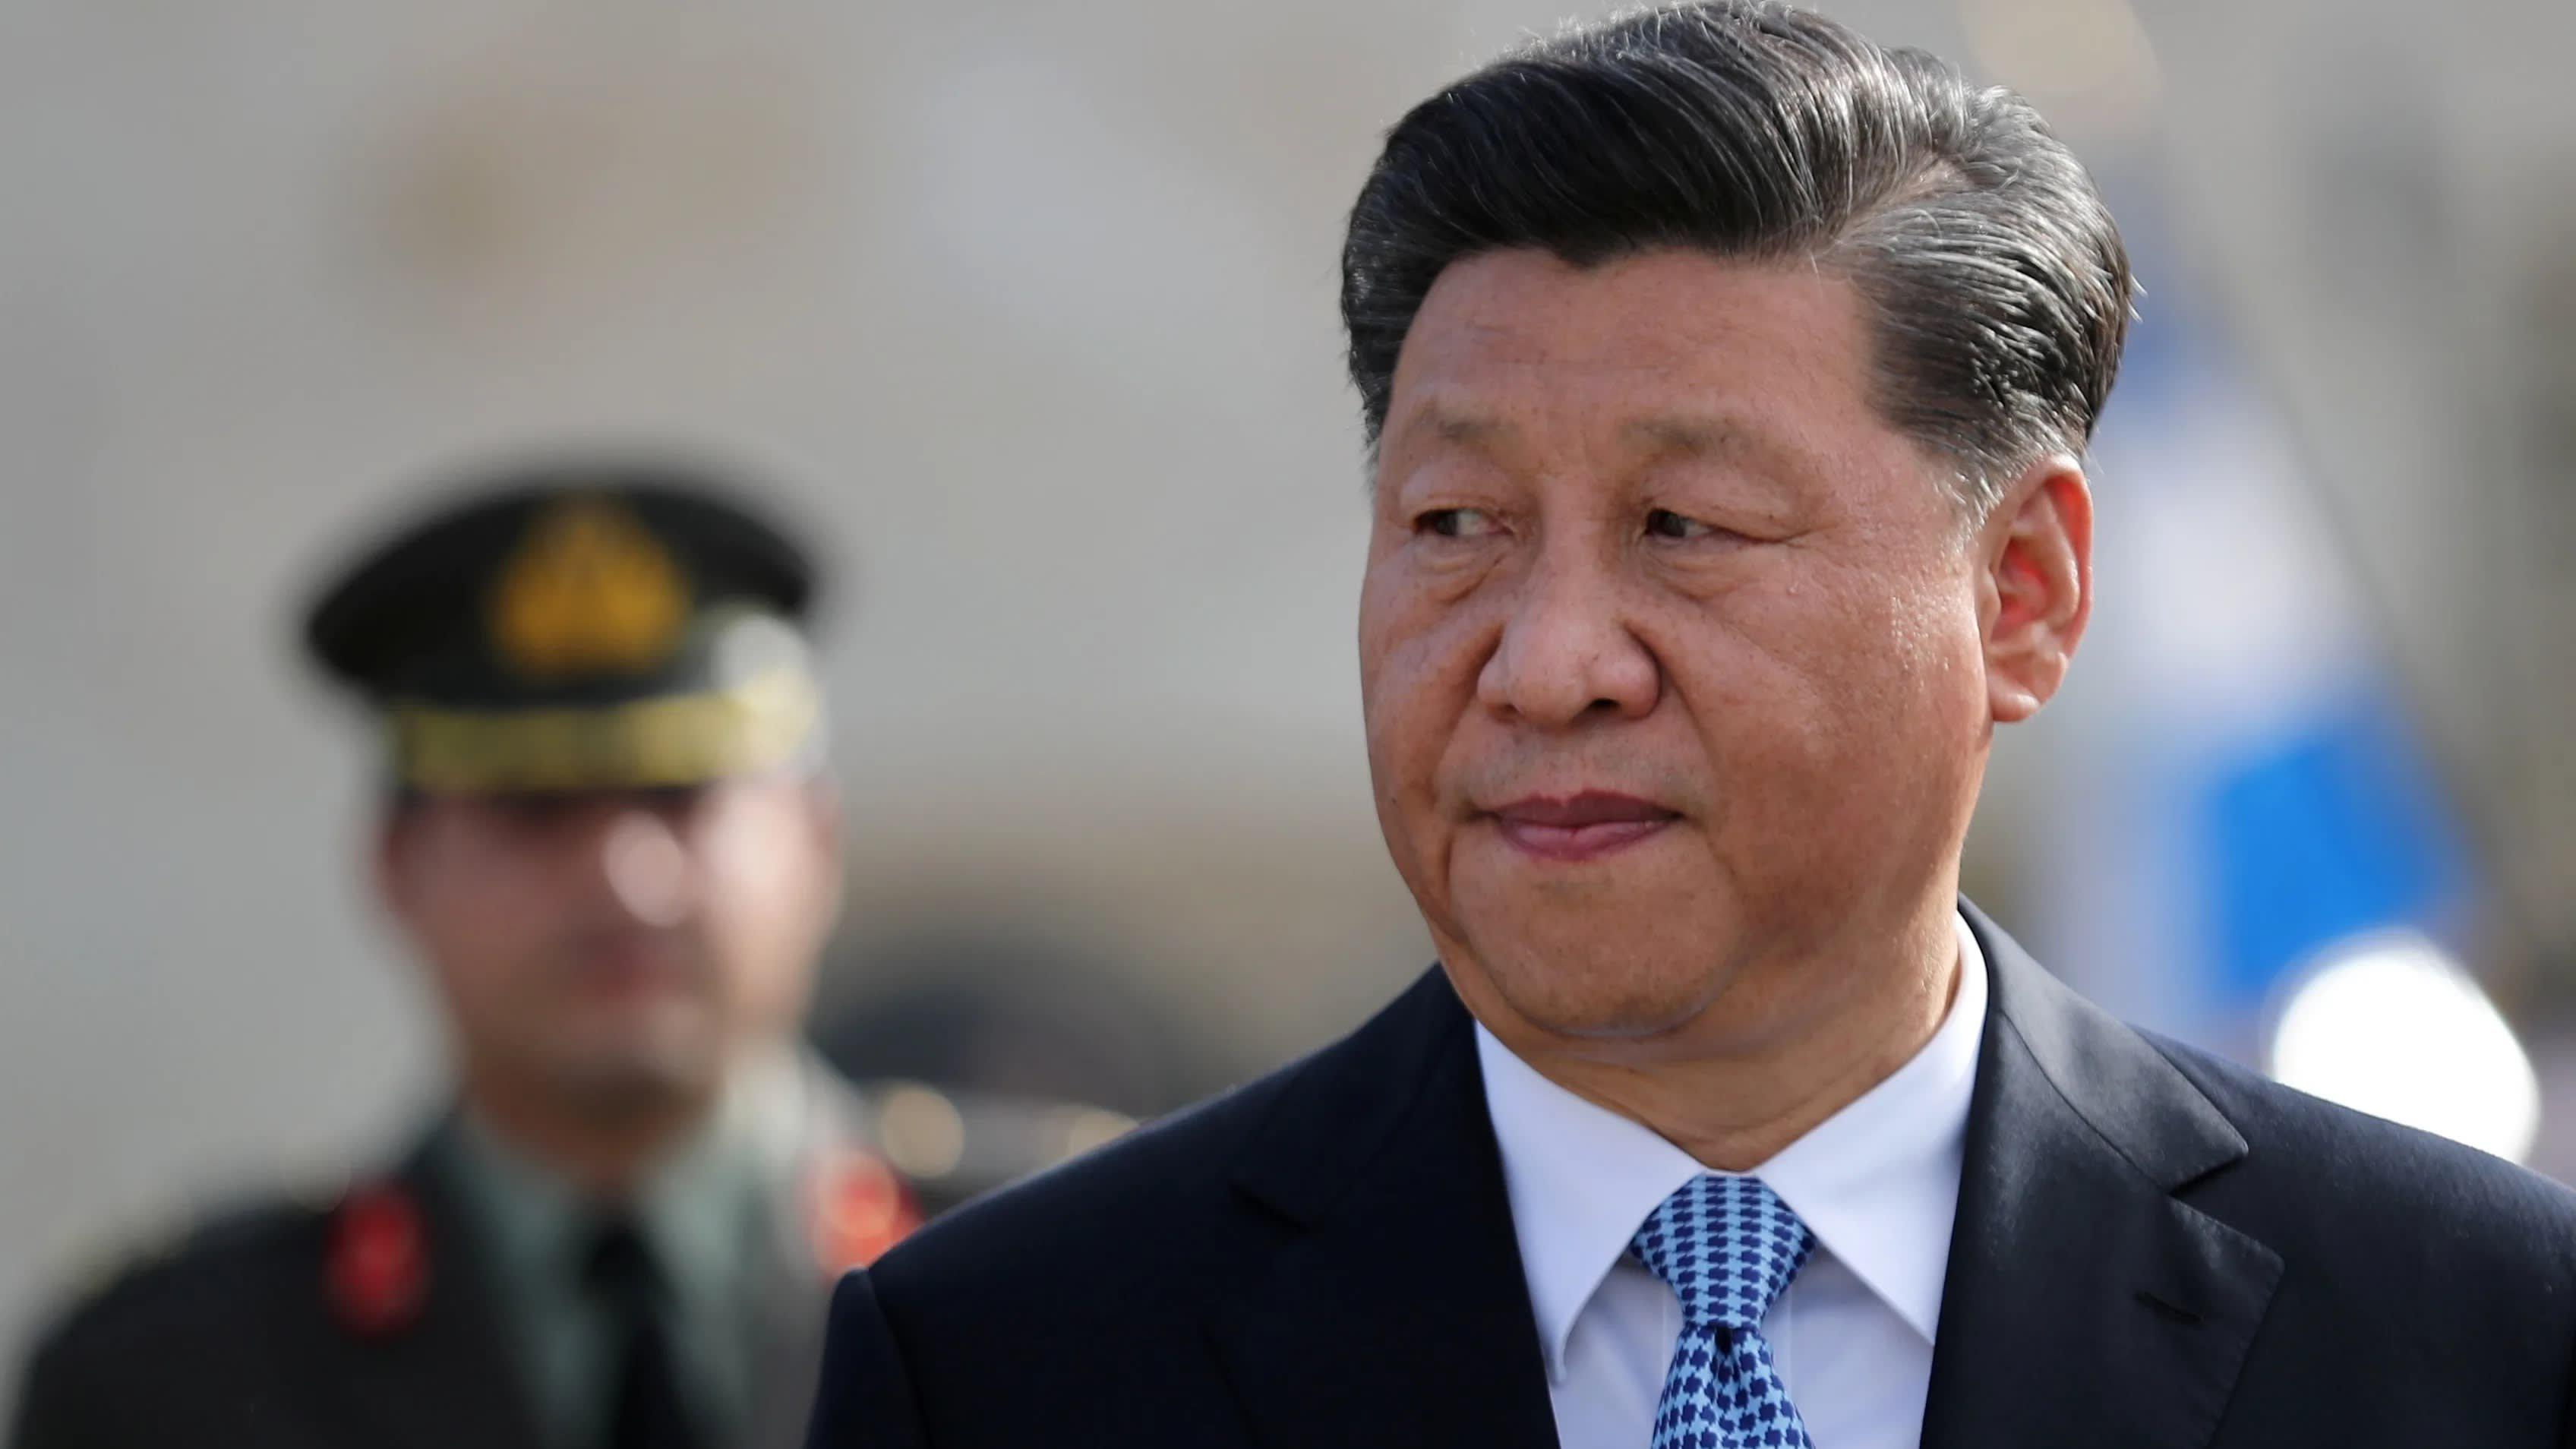 Under fire, Xi recasts himself as early coronavirus fighter ...